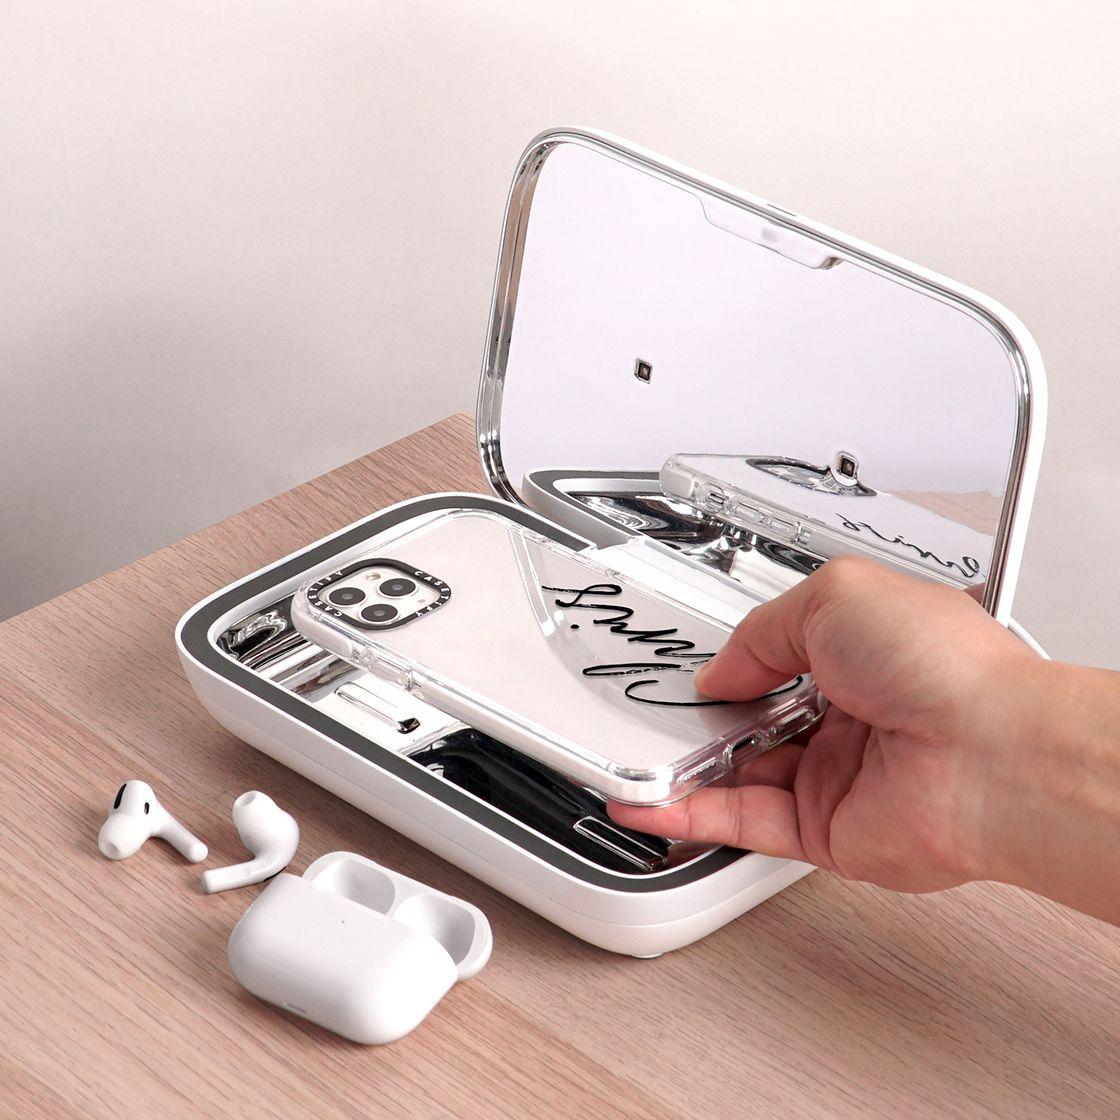 UV Phone Sanitizer | Stay at Home Mum